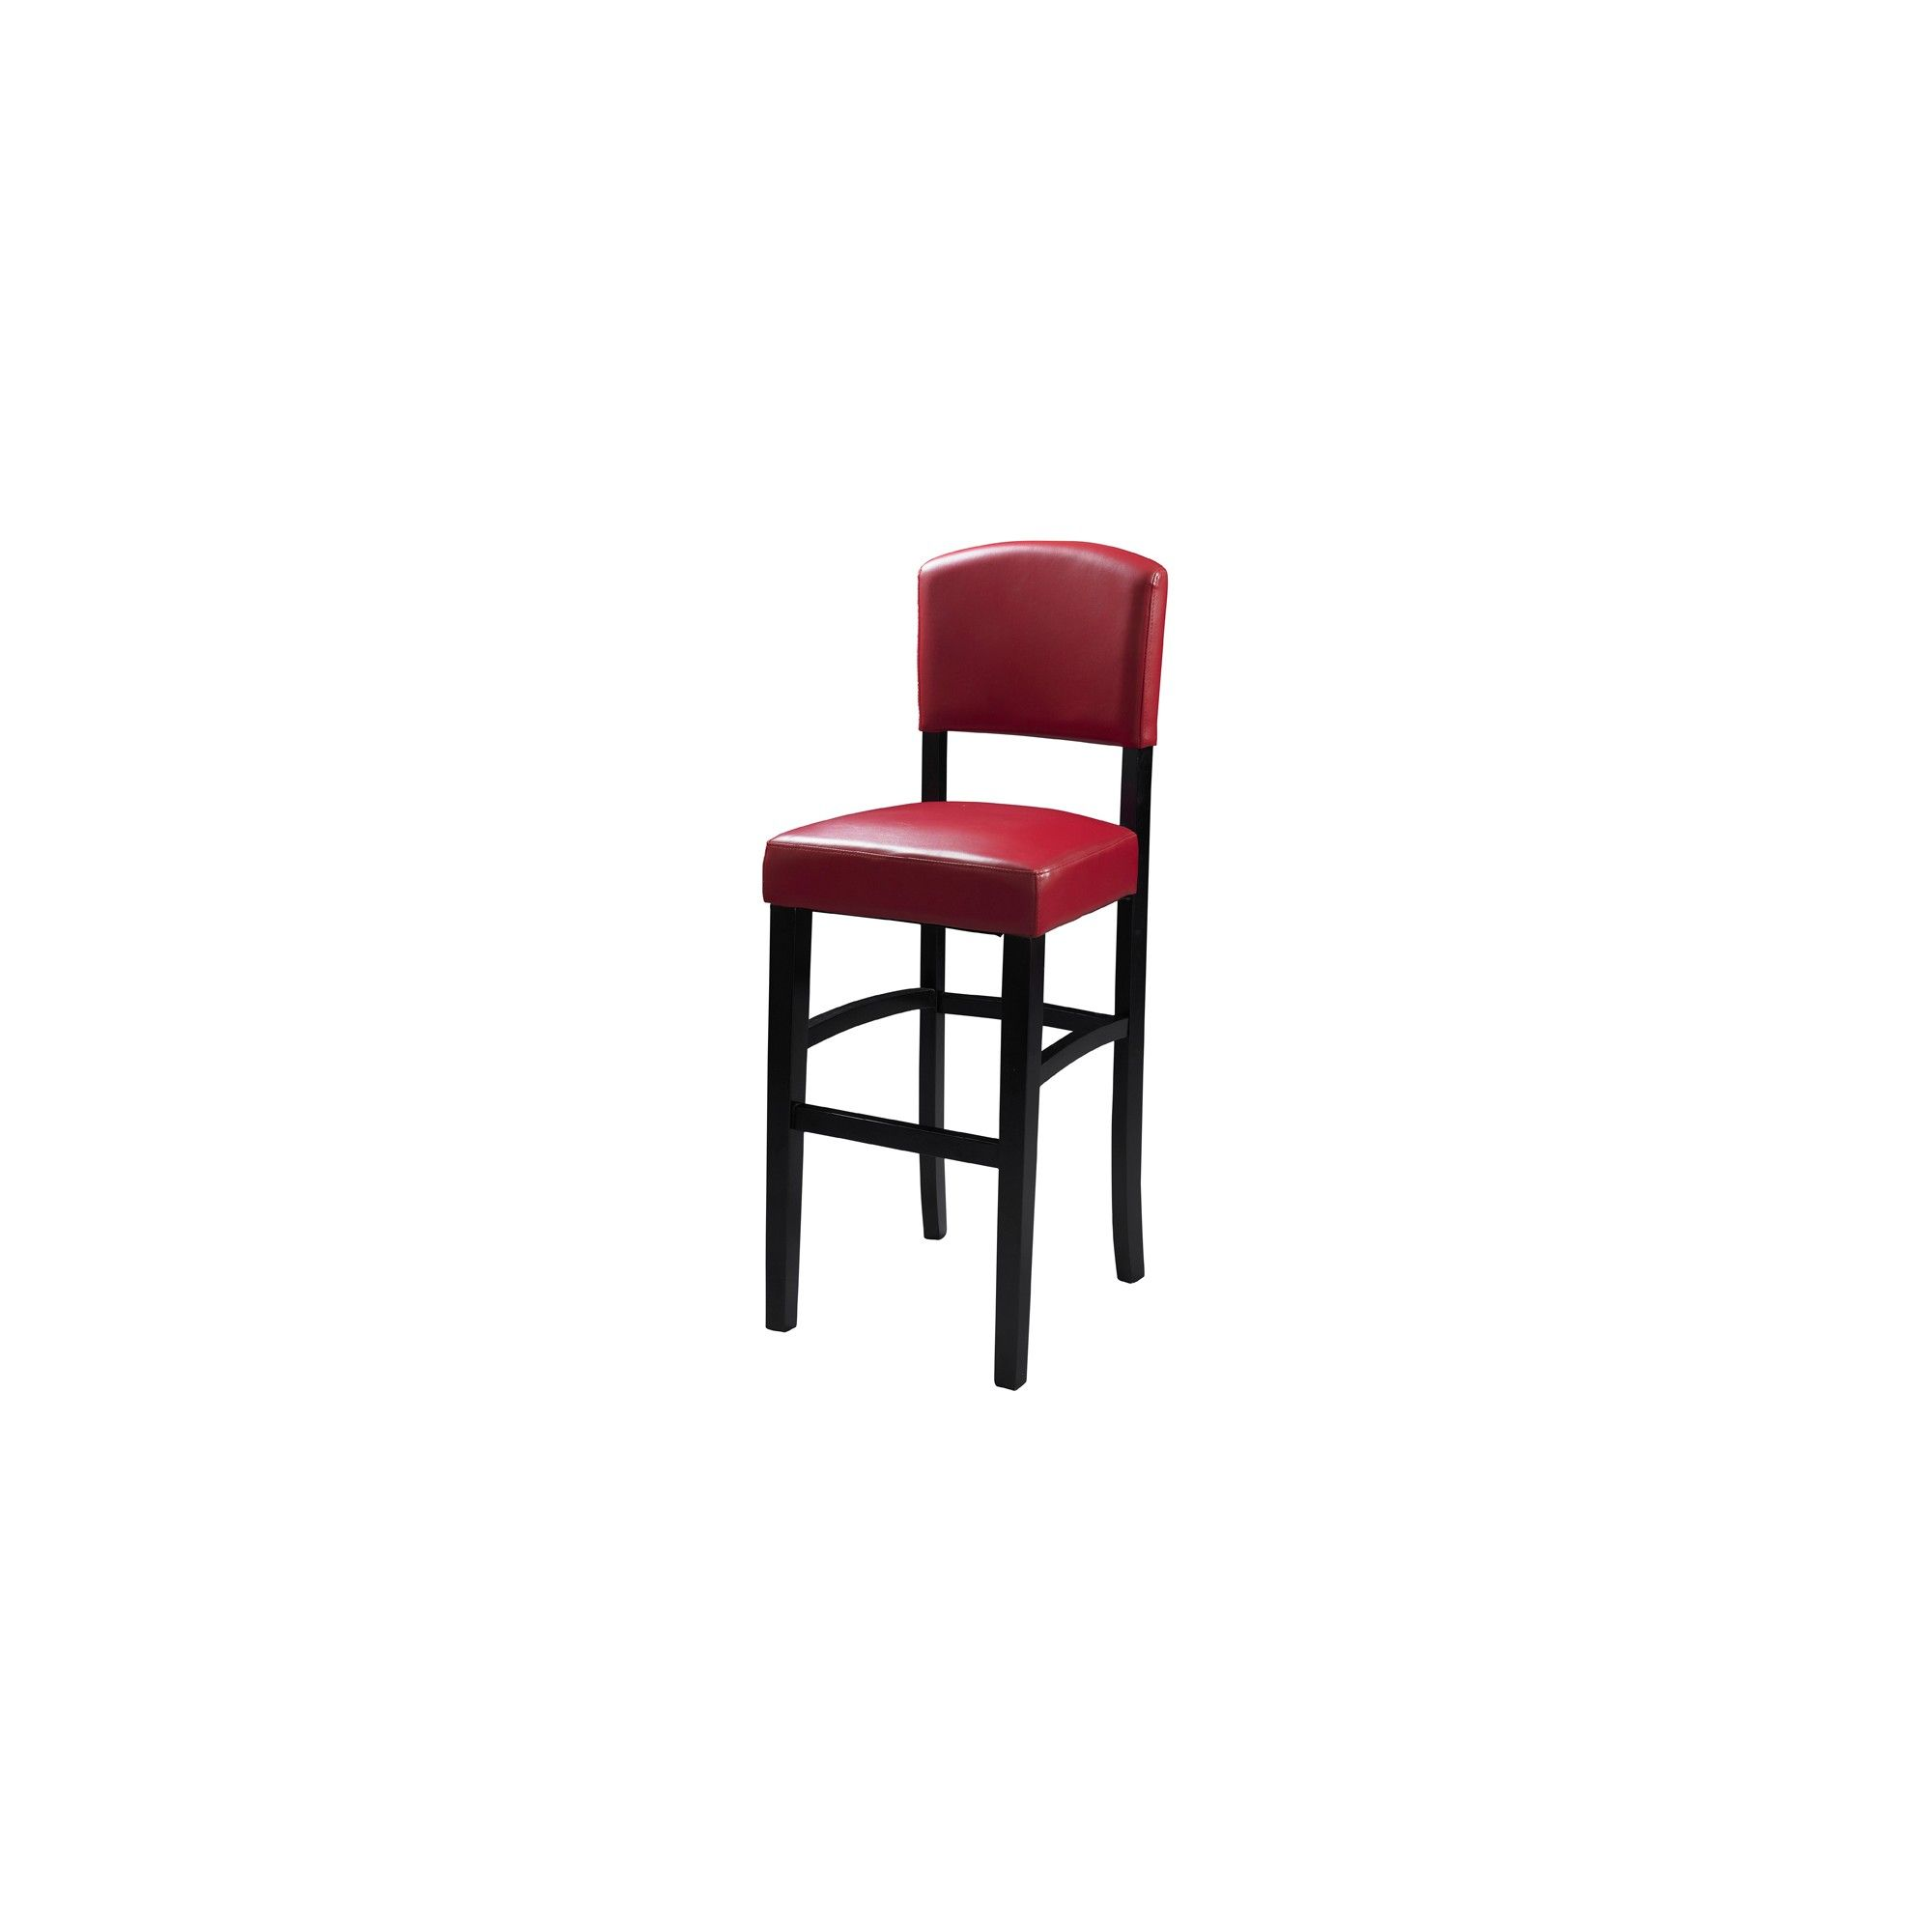 Prime 24 Monaco Counter Stool Hardwood Red Linon In 2019 Machost Co Dining Chair Design Ideas Machostcouk